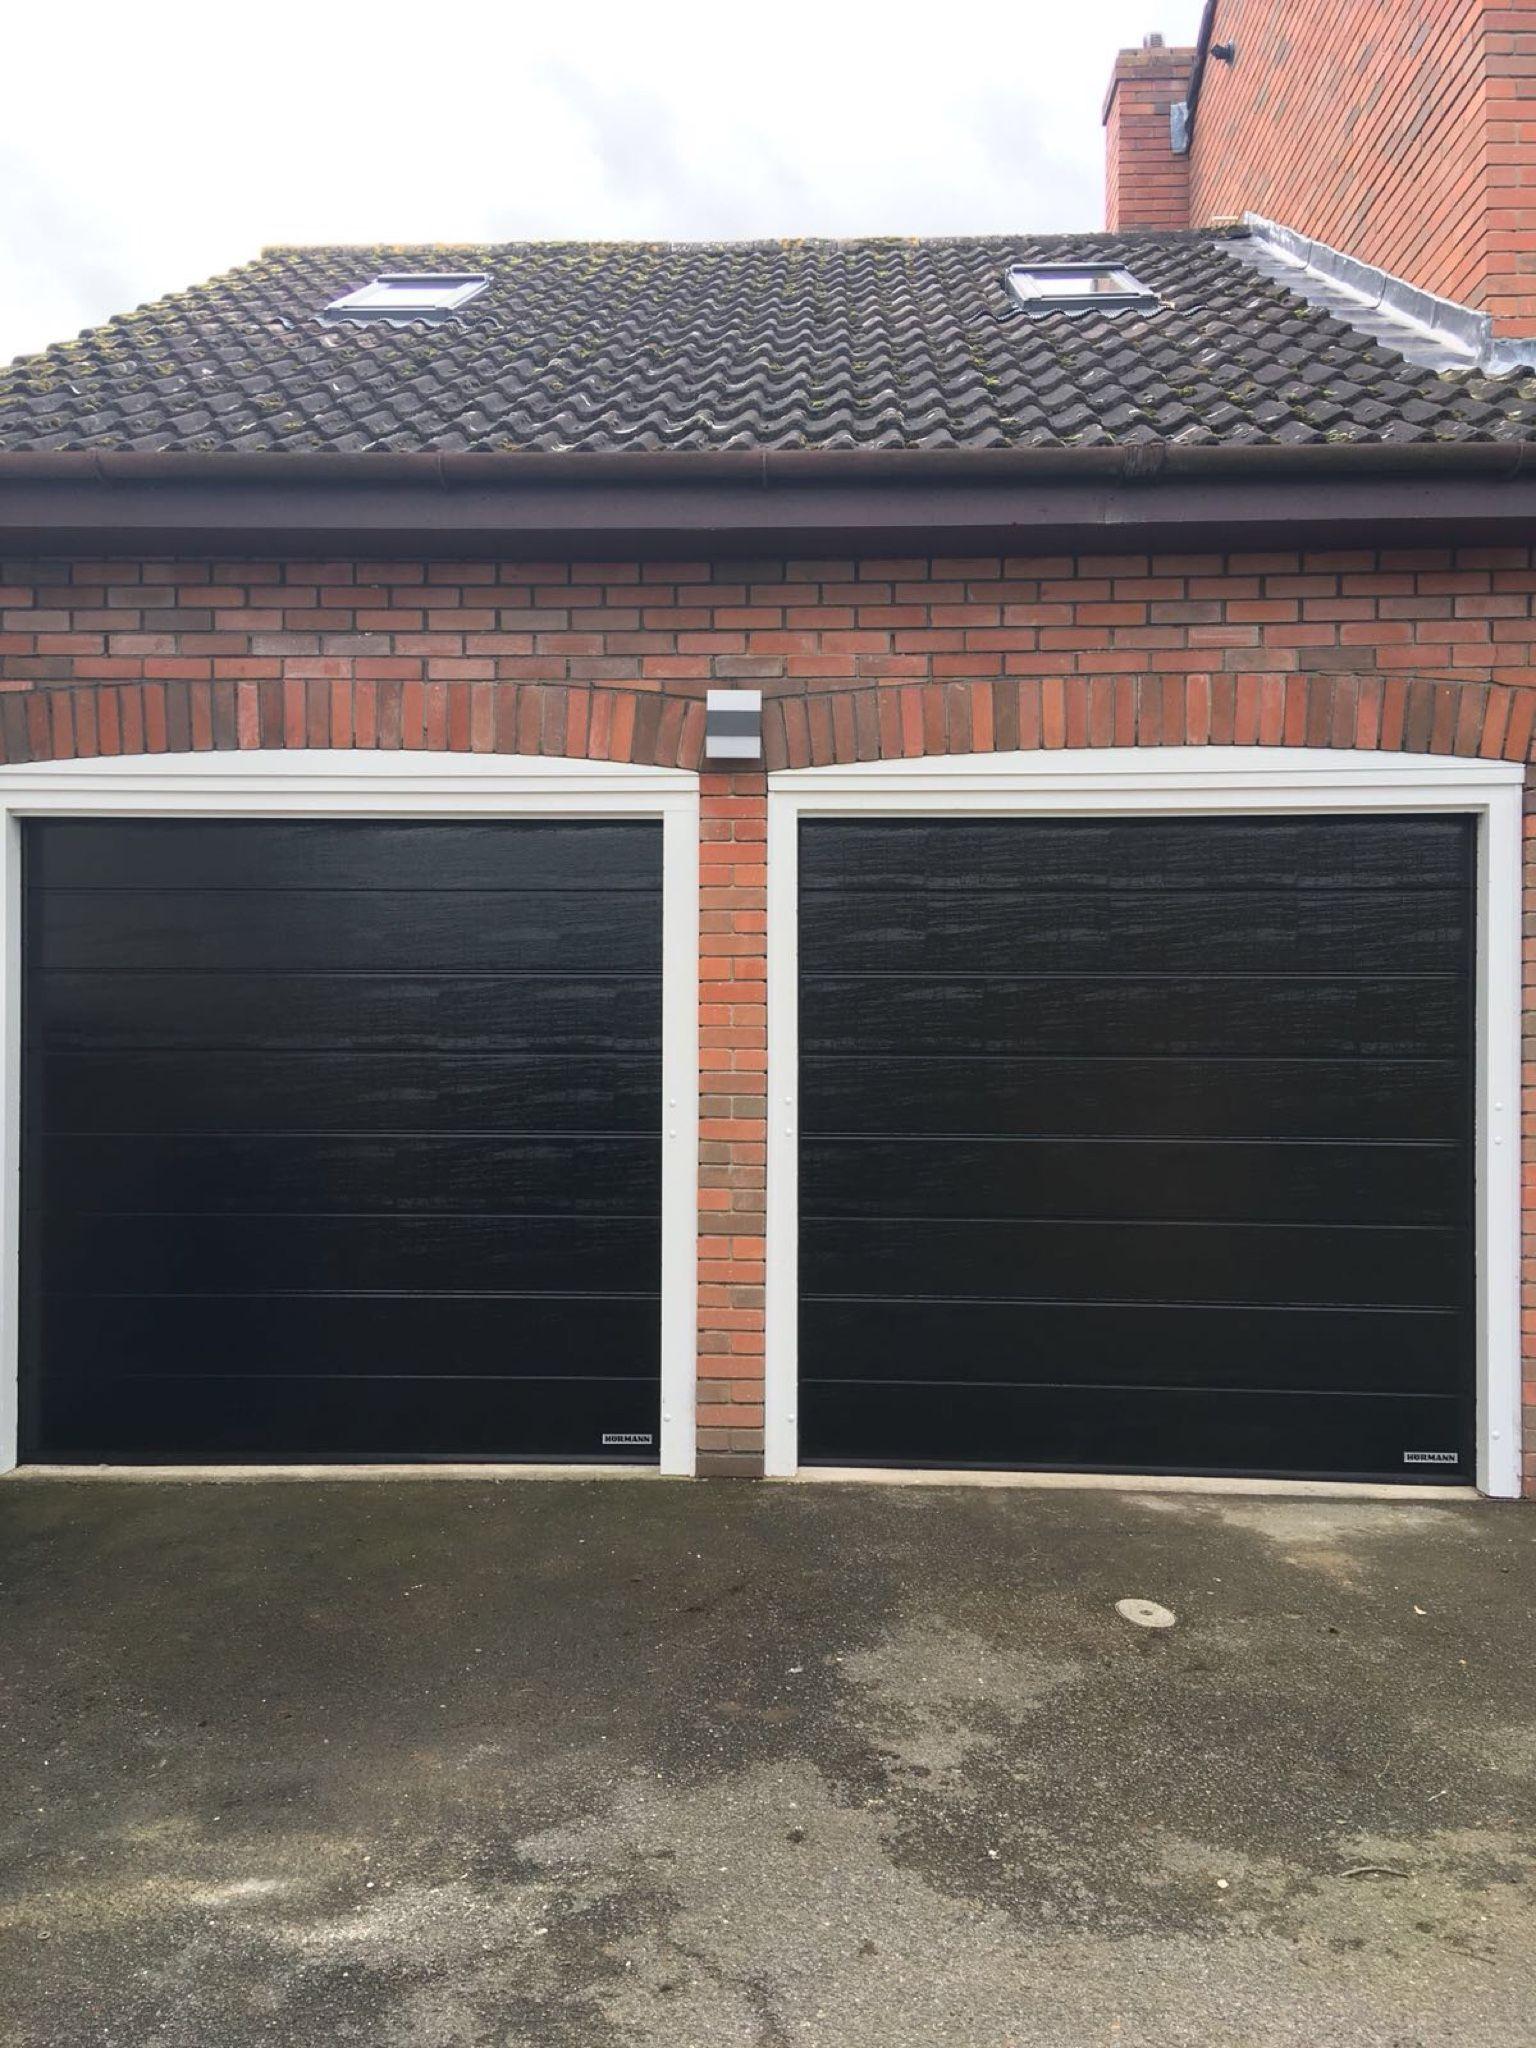 Hormann Sectional Garage Doors Black Garage Doors Sectional Garage Doors House Paint Exterior